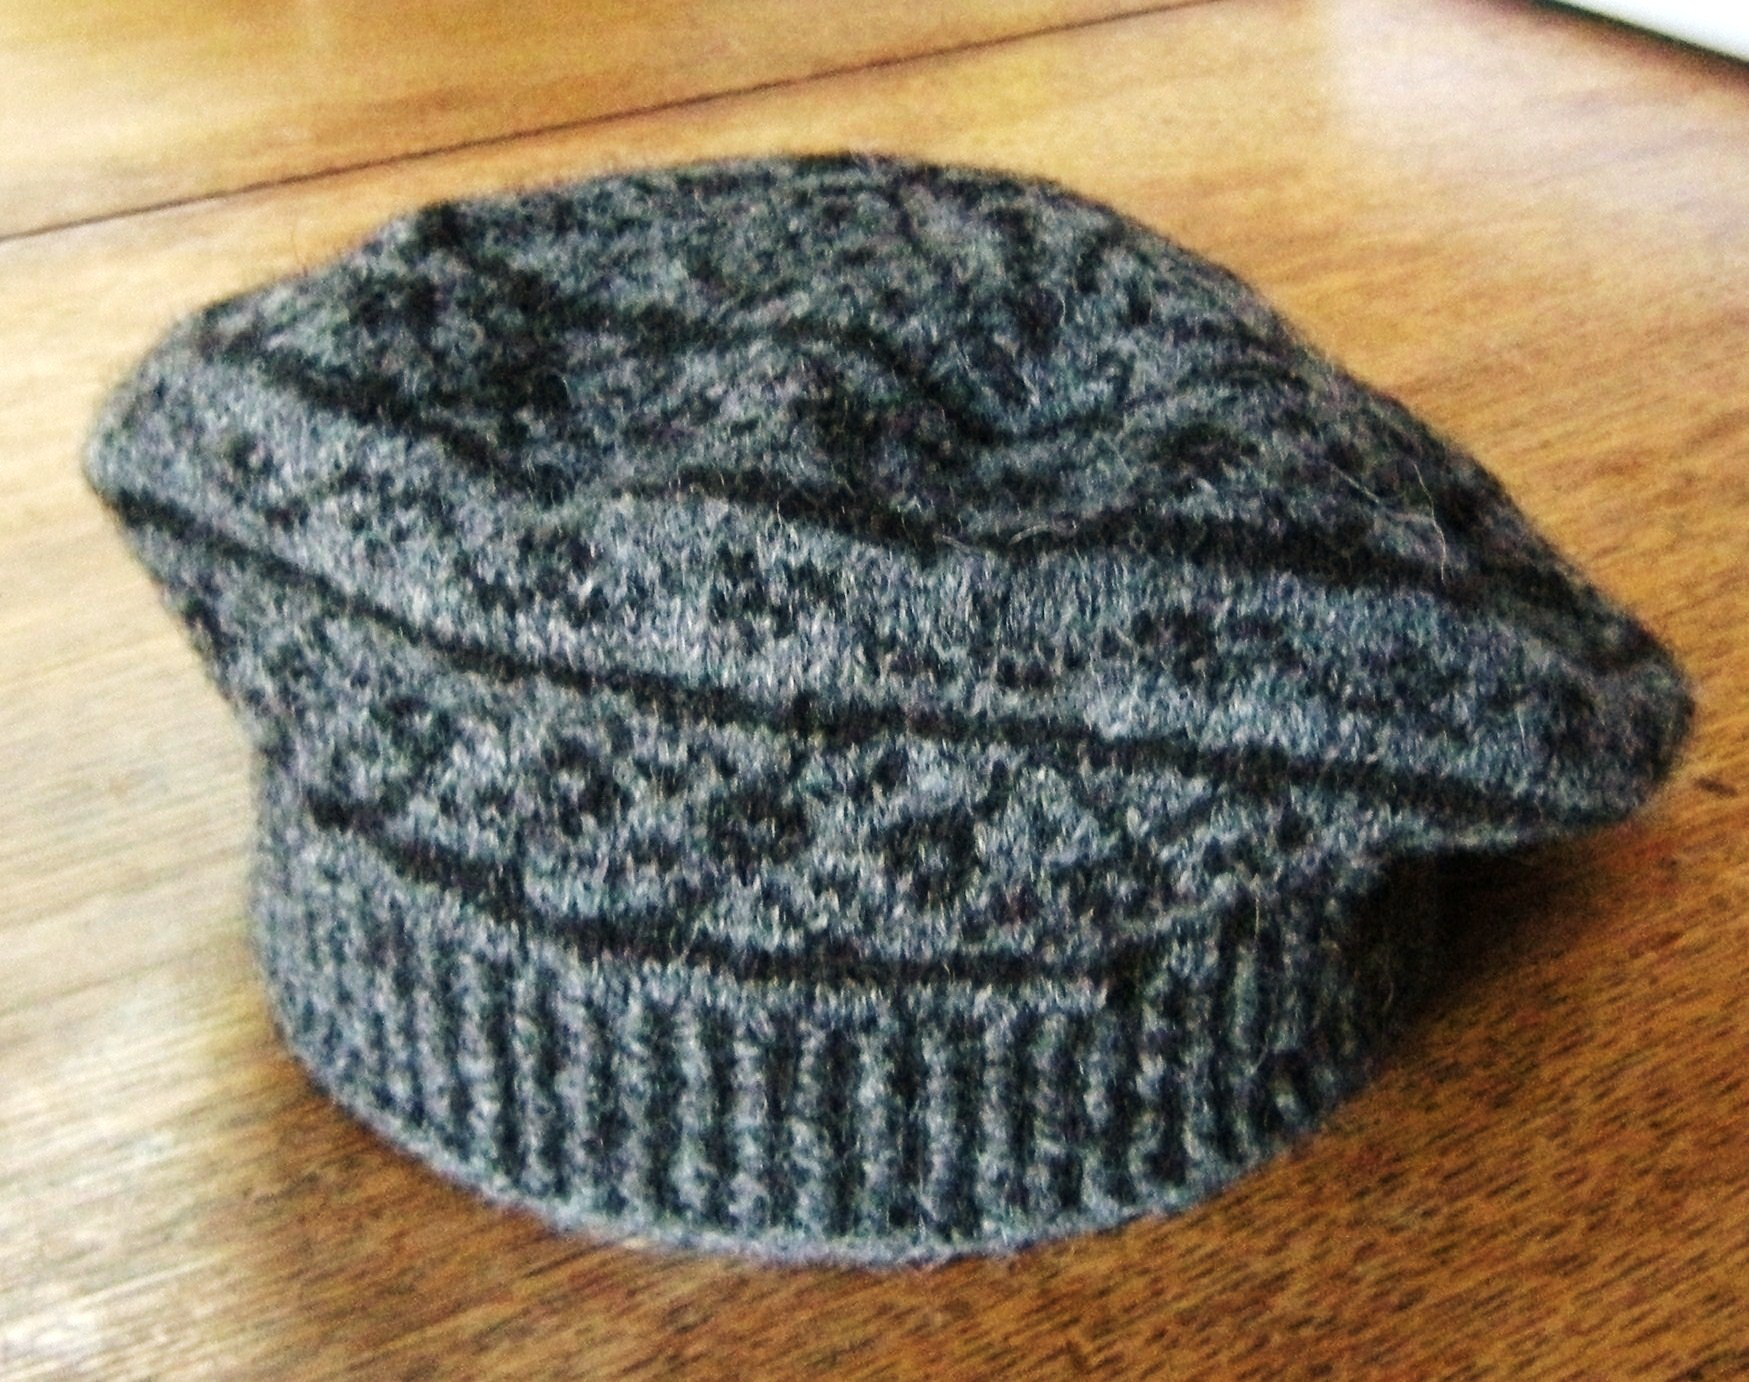 Fairisle Knitting Patterns Free Fair Isle Knit Hat Pattern Free Ipaa For